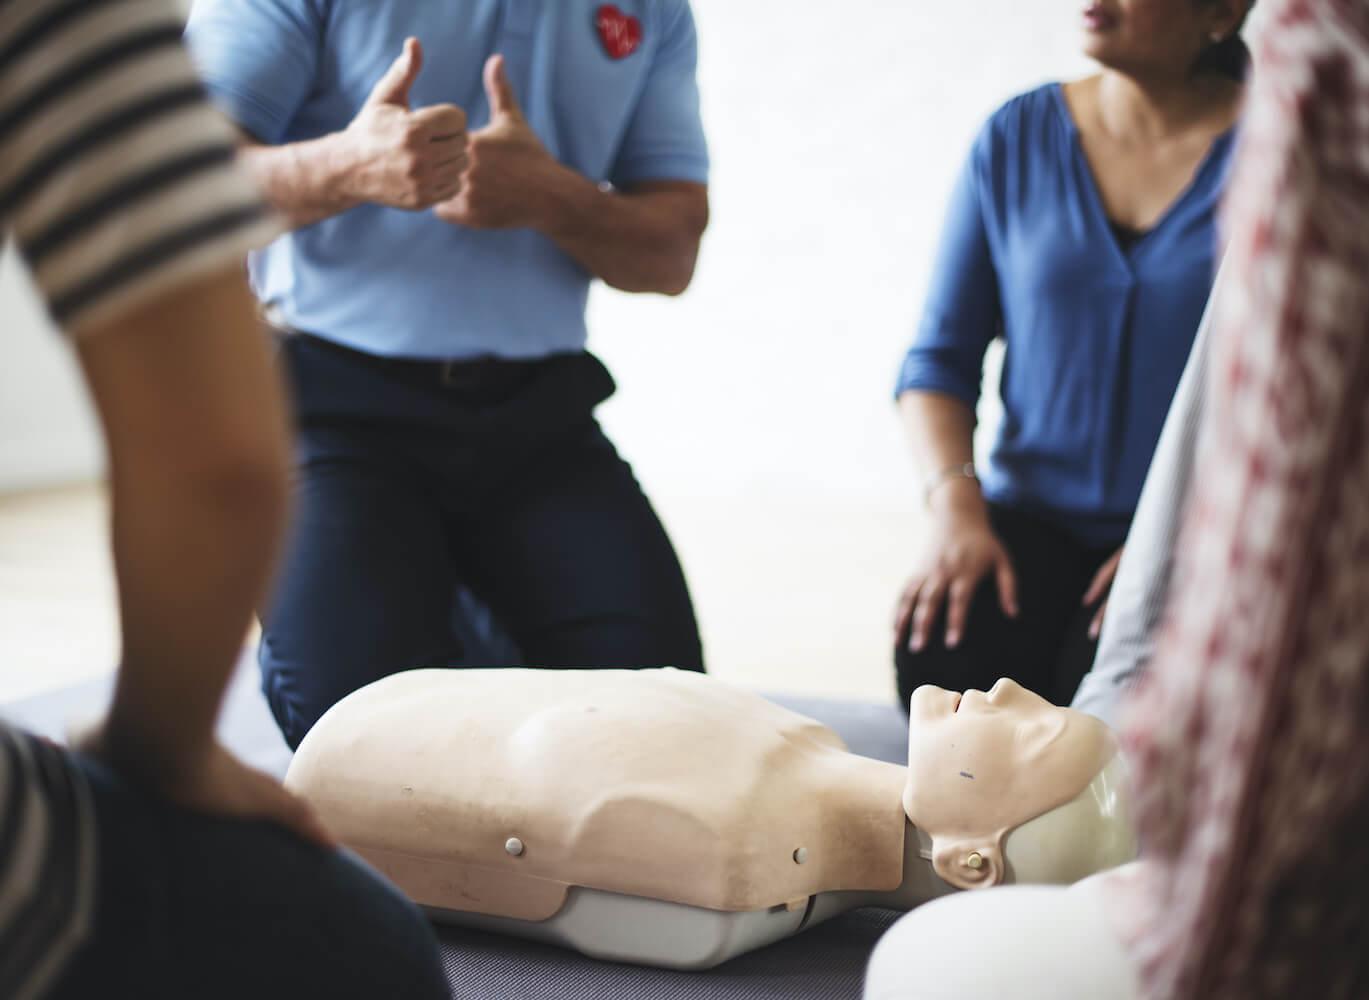 Reanimatie redt levens